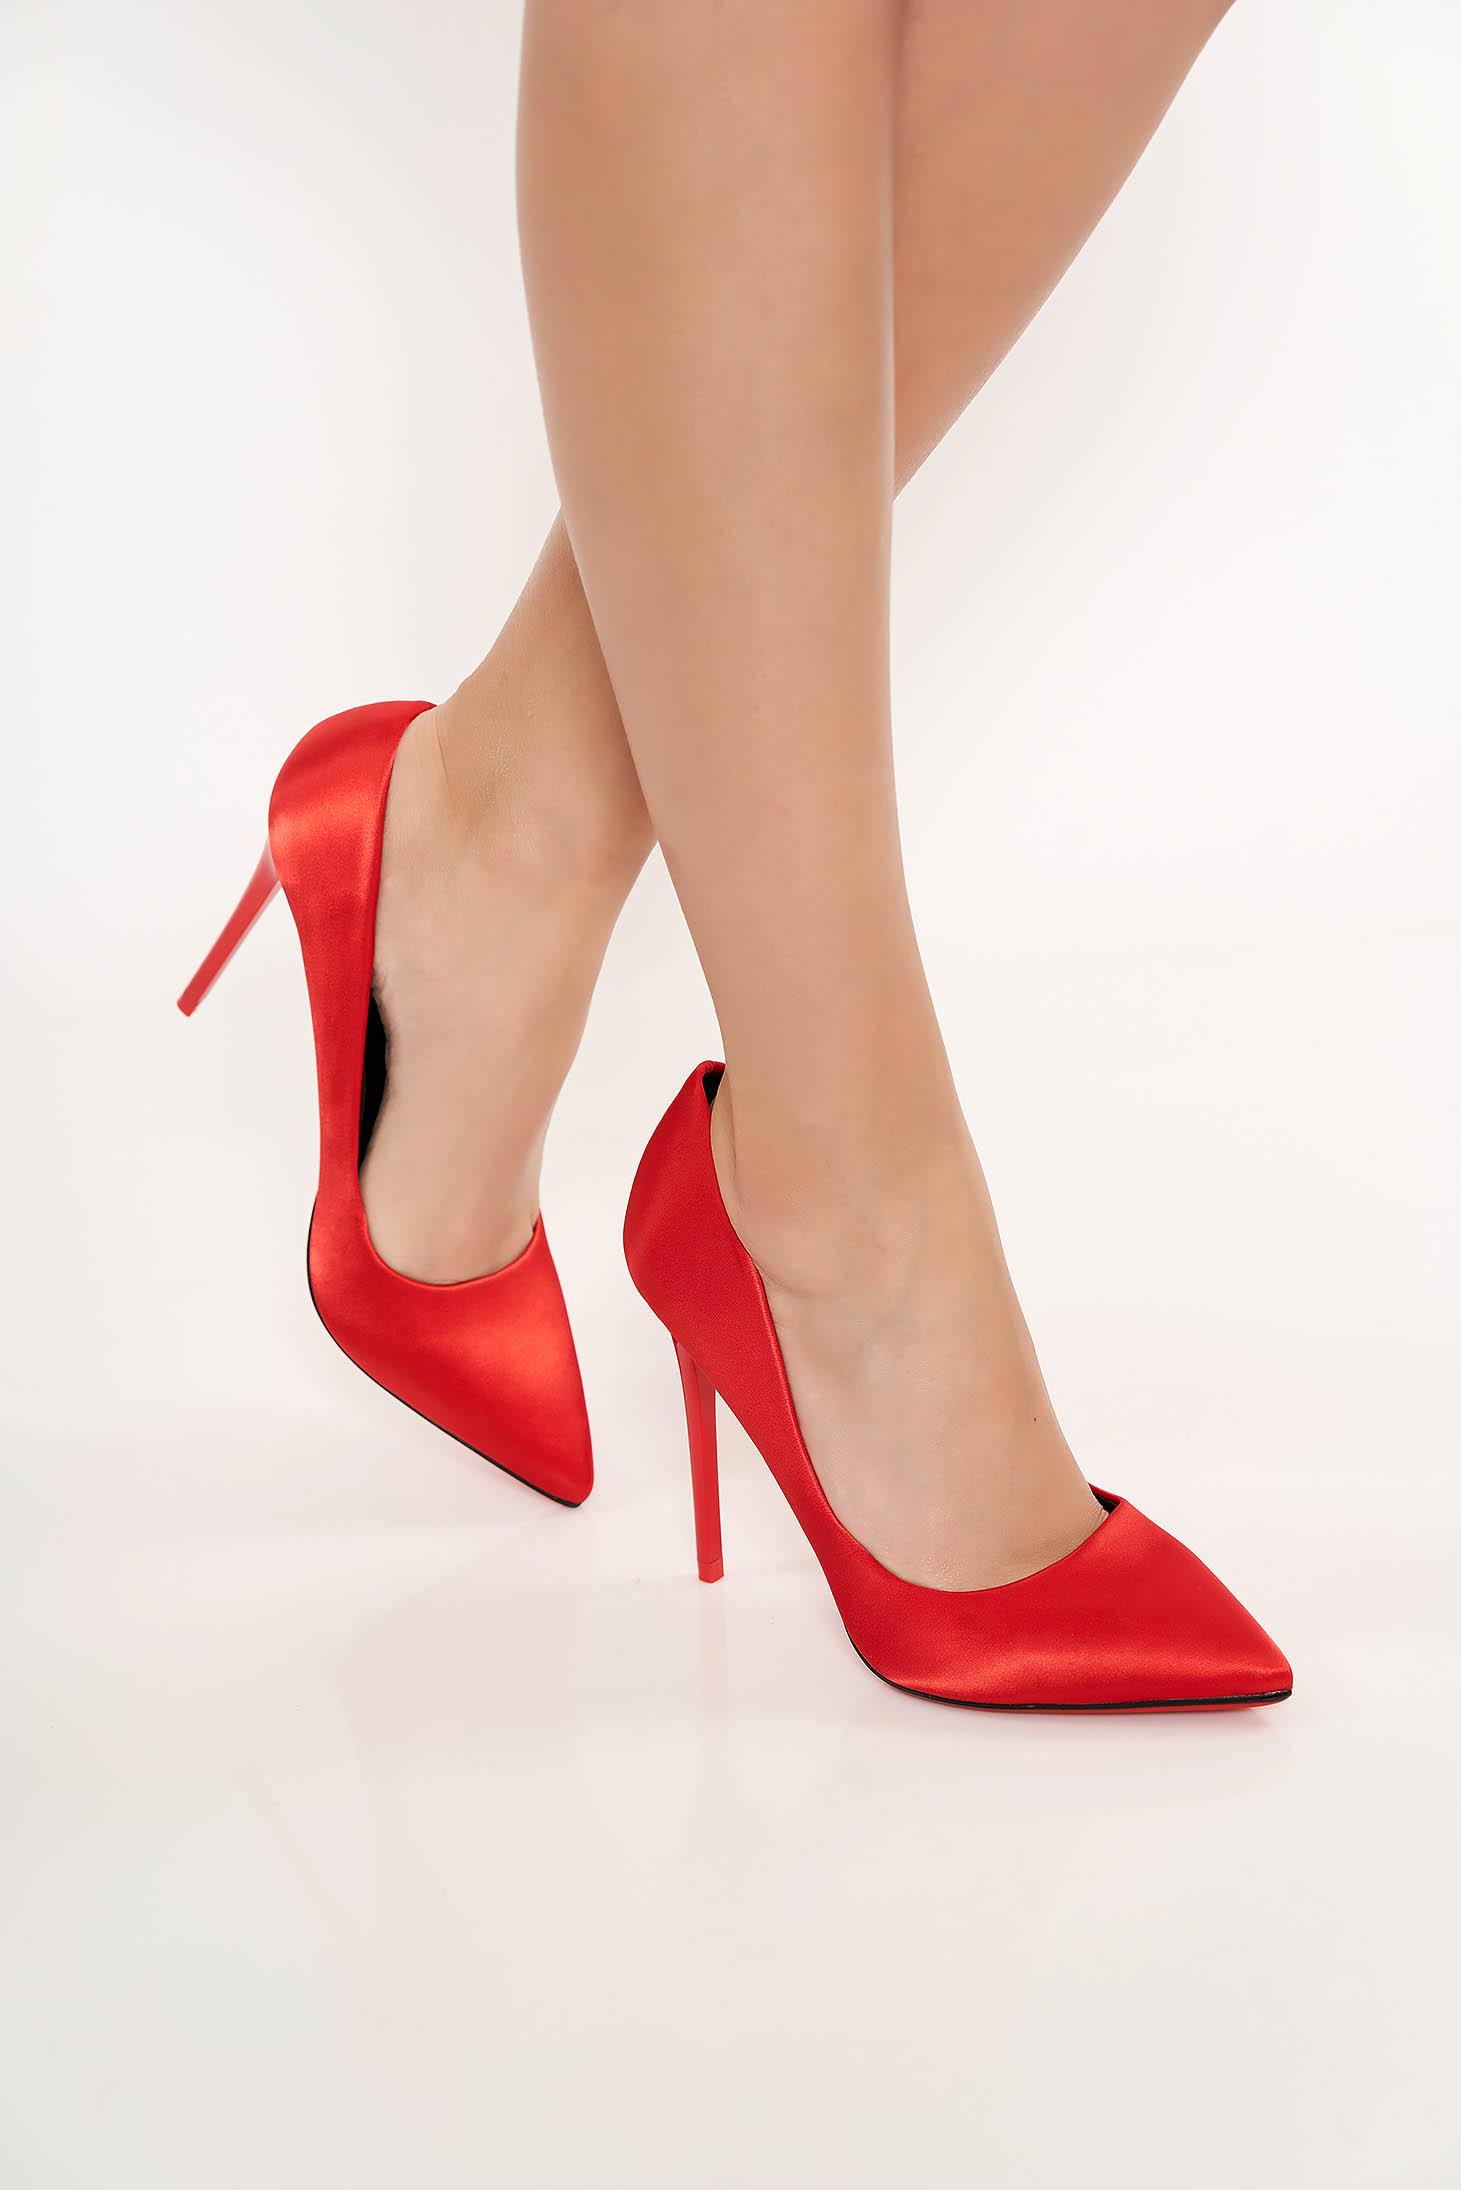 Pantofi rosii eleganti cu toc inalt din material satinat cu varful usor ascutit